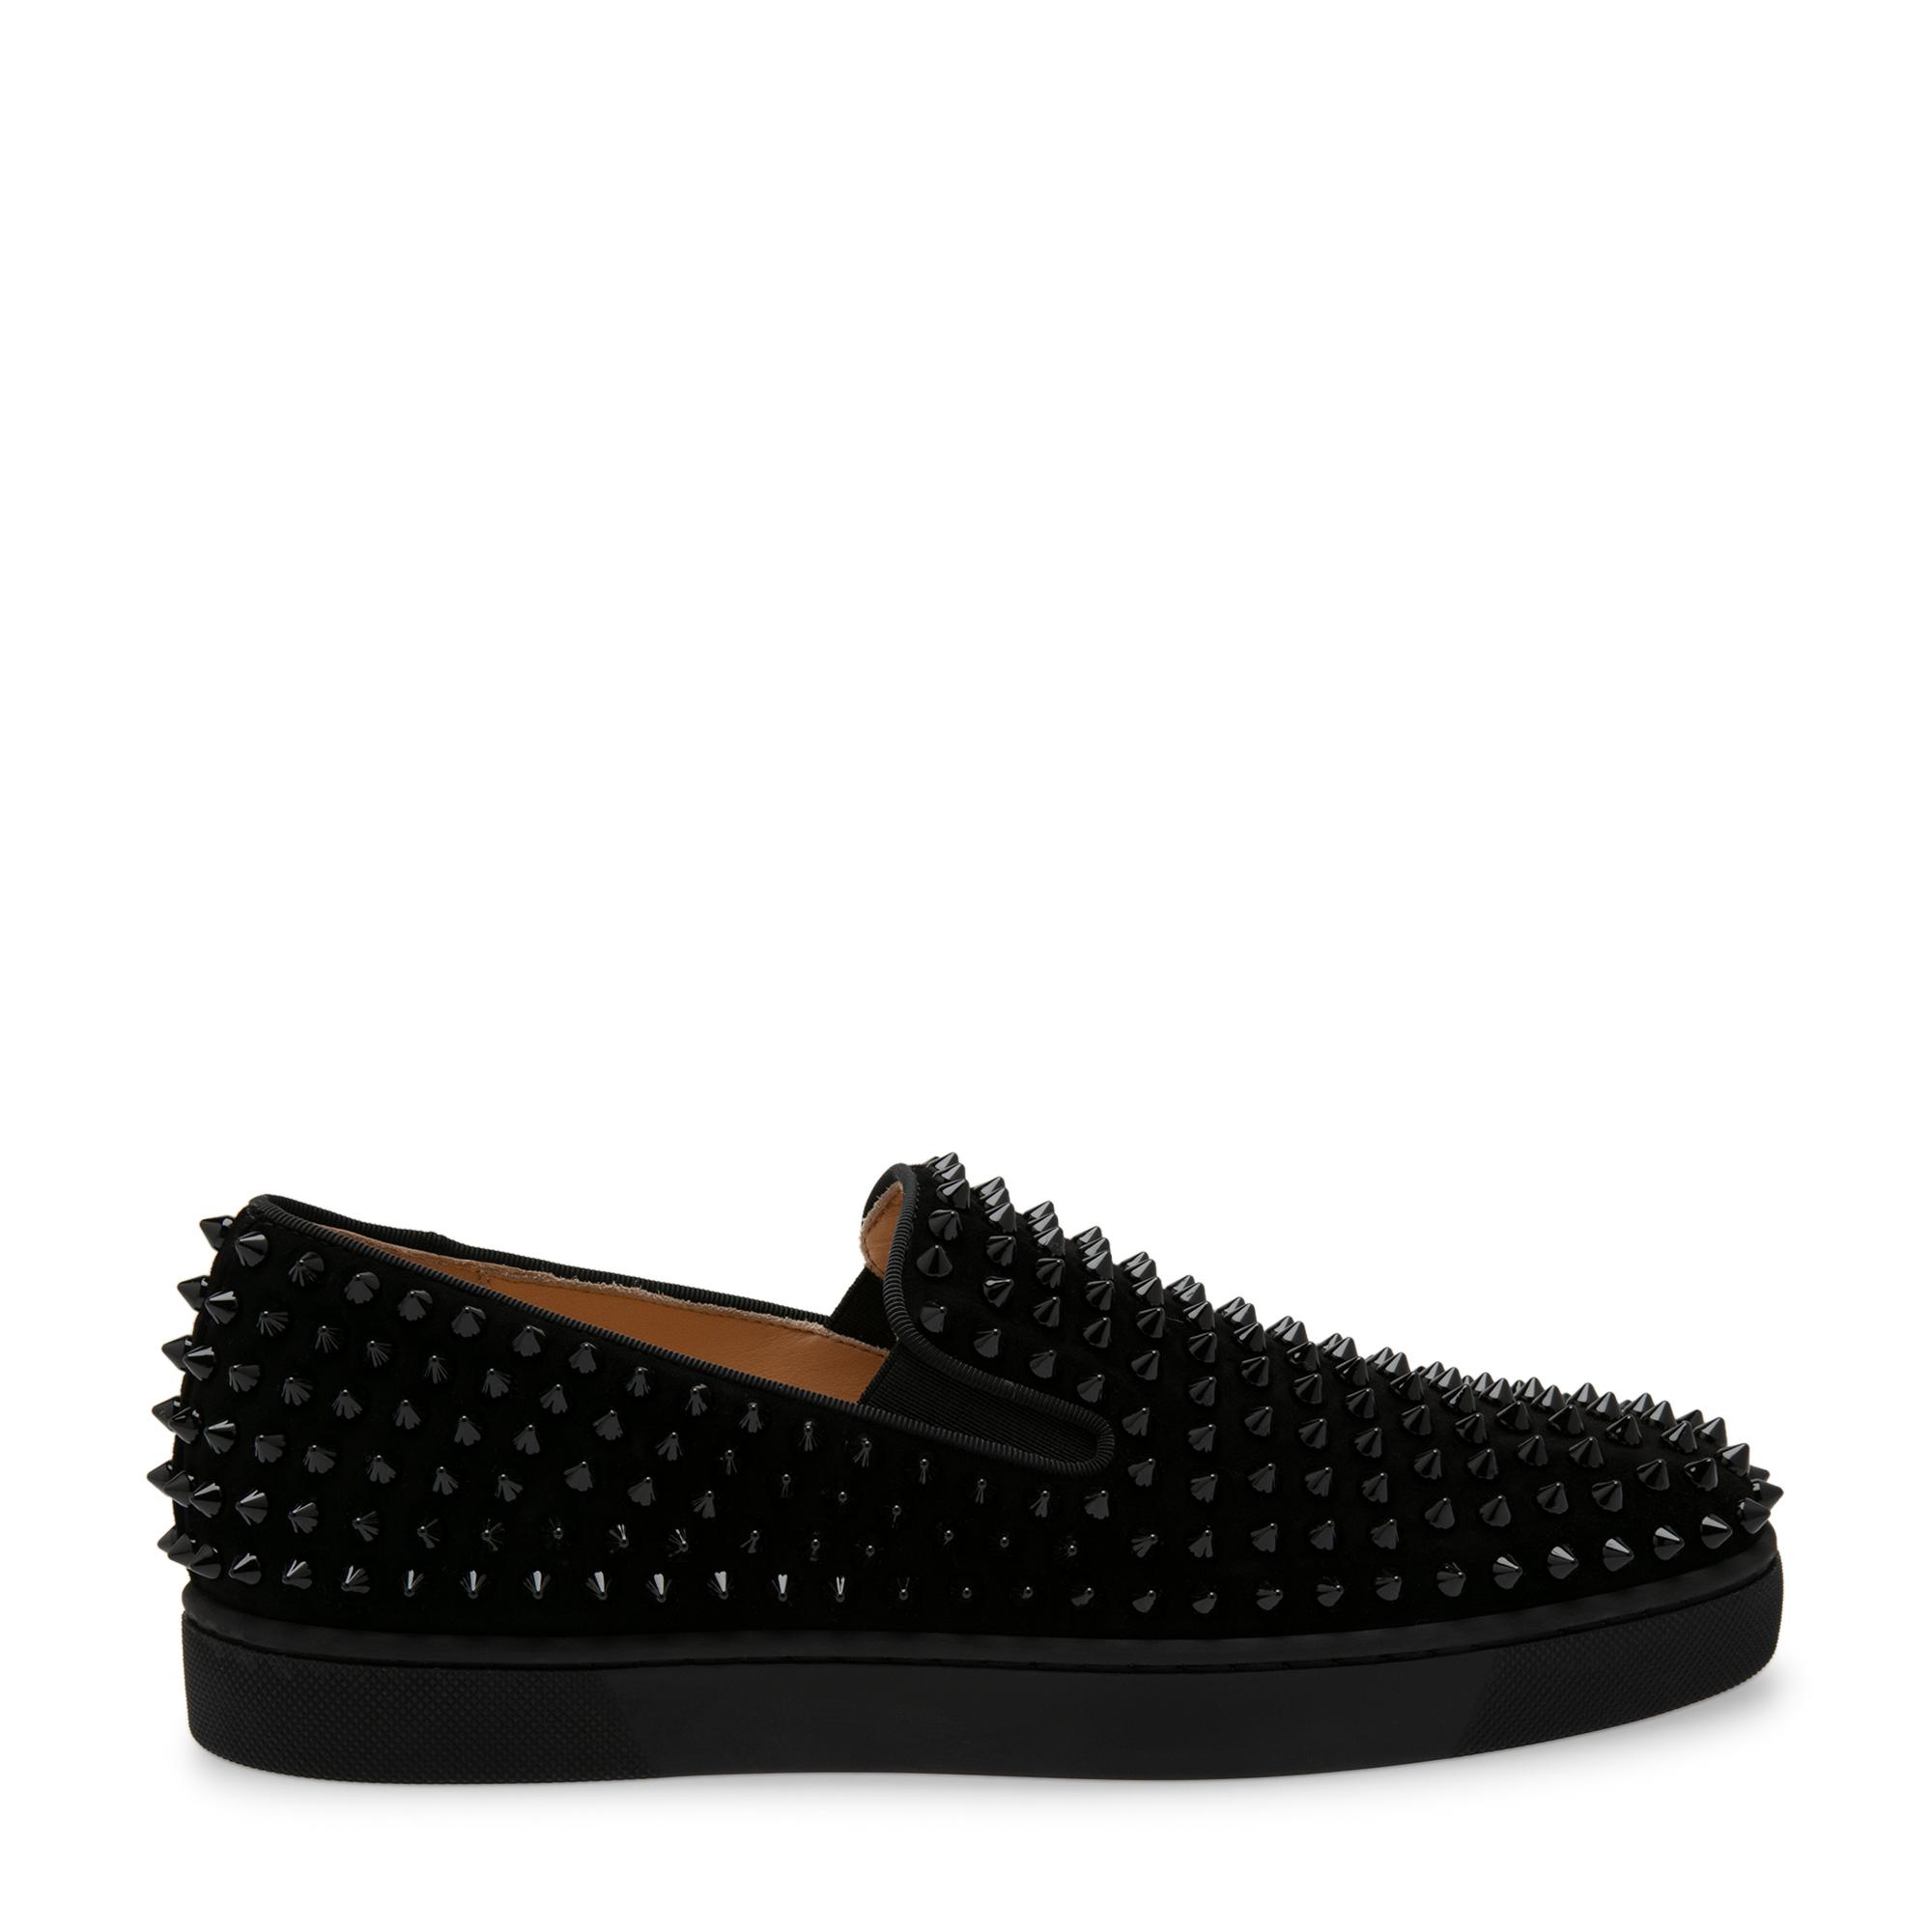 Spike embellished sneakers